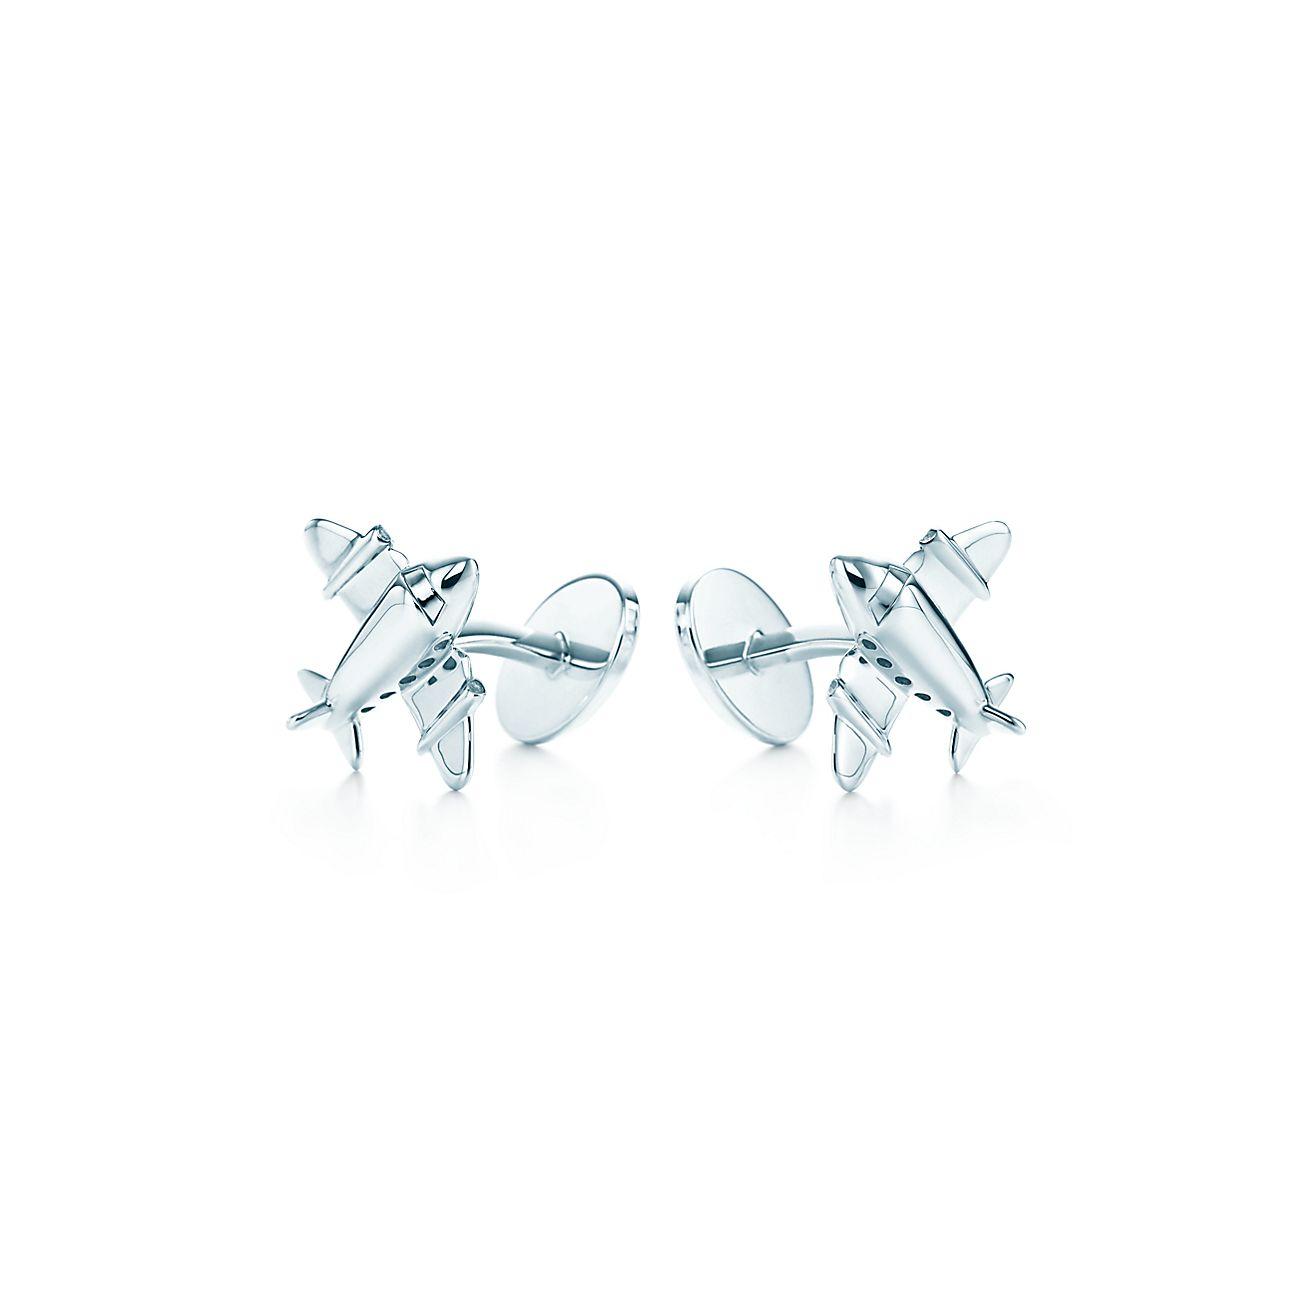 Accessories Cuff Links Airplane Cuff Links 26021928 Tiffany Cuff Links